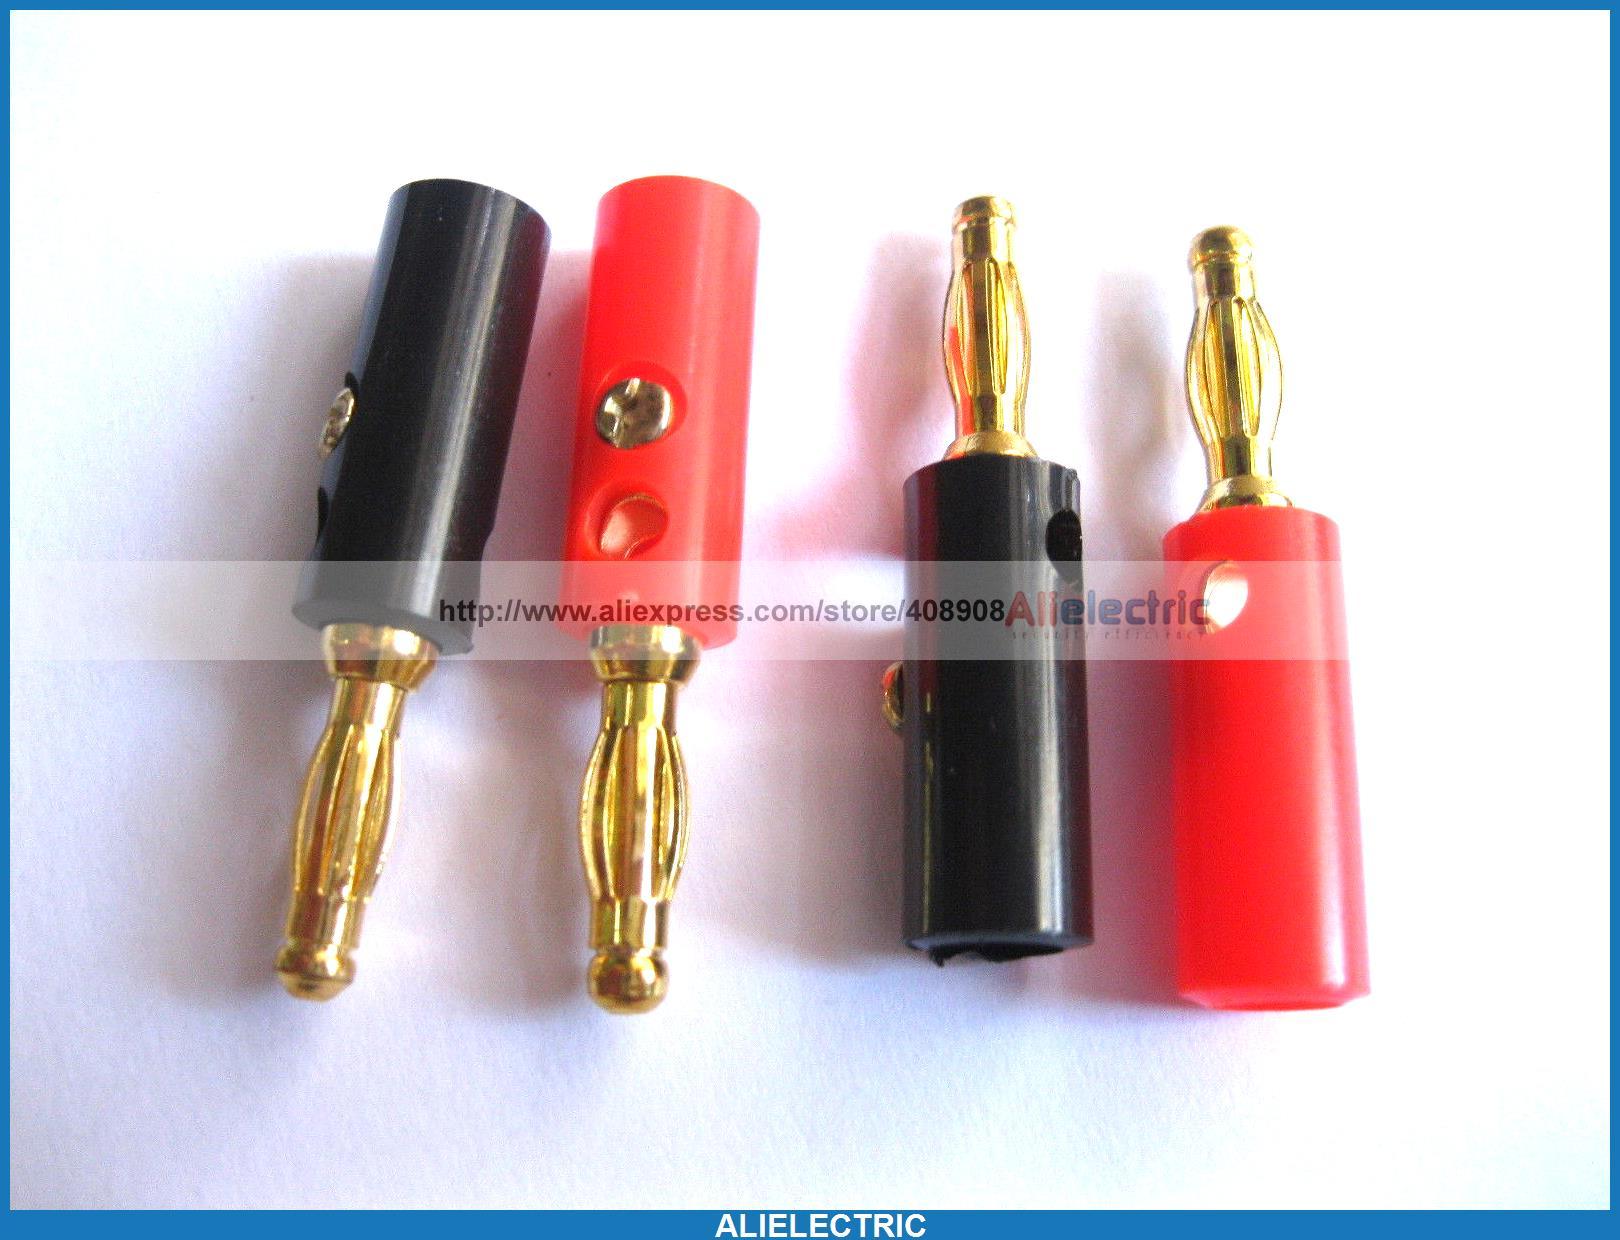 80 Pcs Banana Plug Gold Plated Red Black 40mm 215